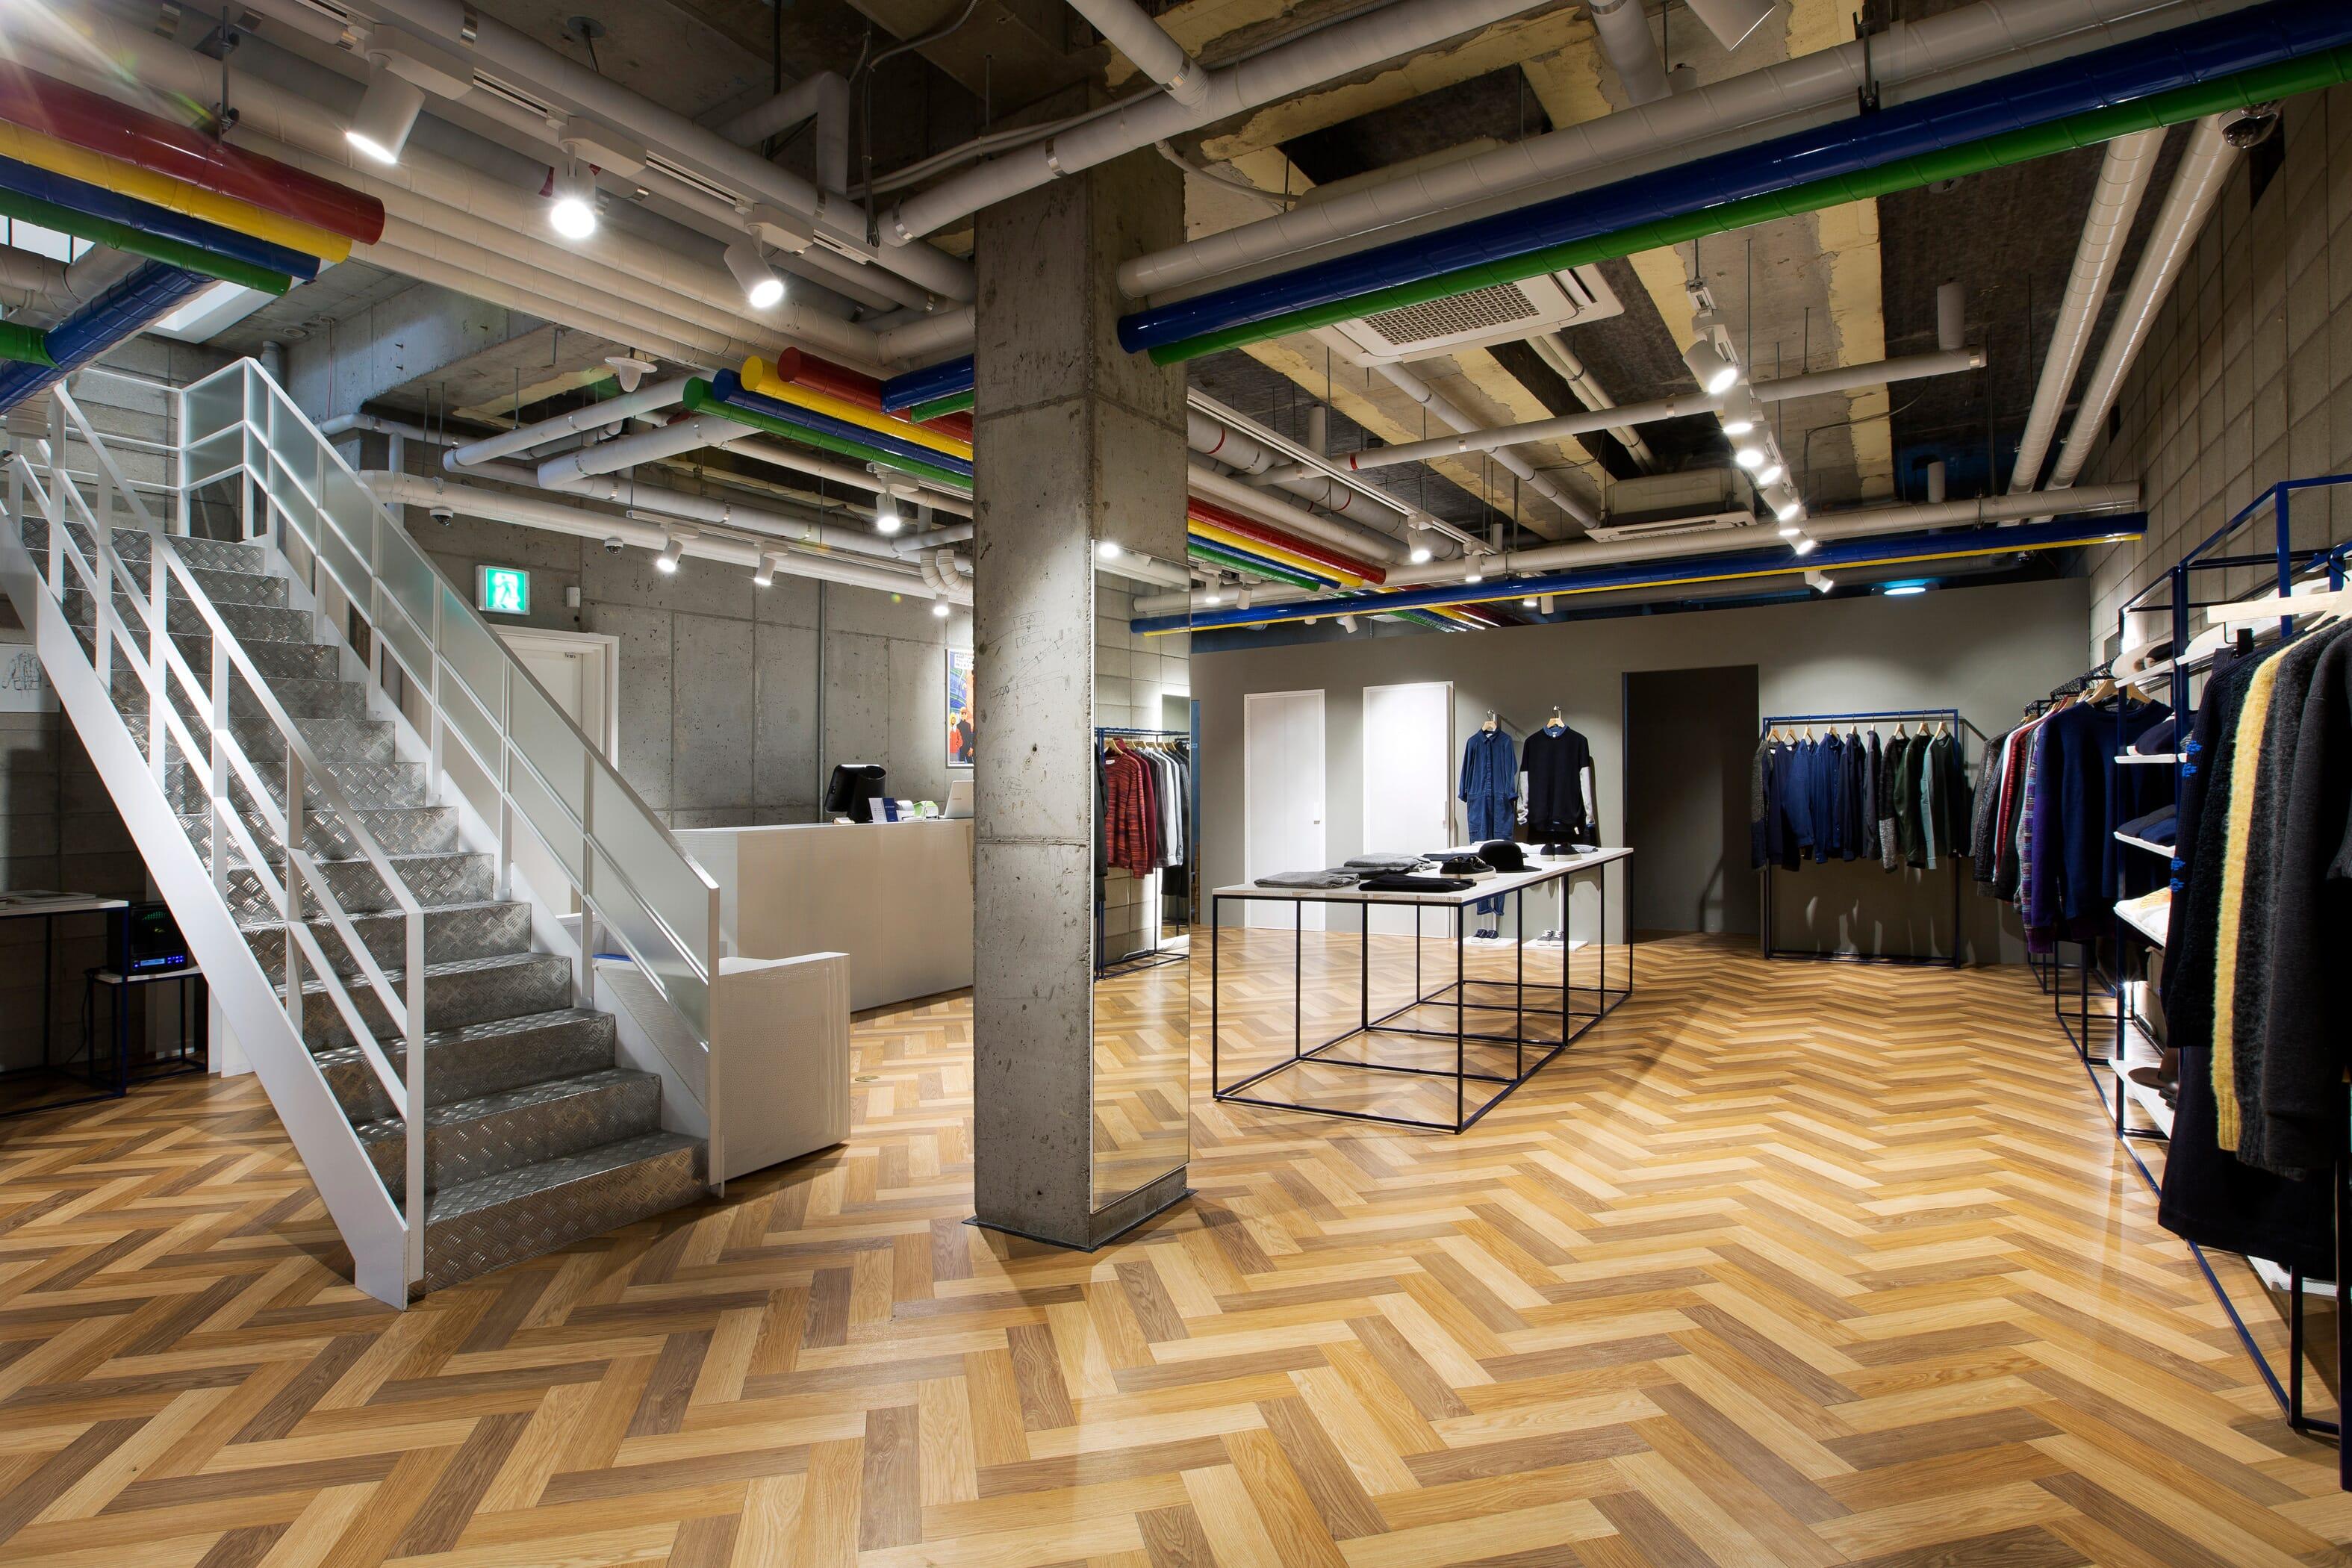 ymc-seoul_aw16-store_interior_b1f_4